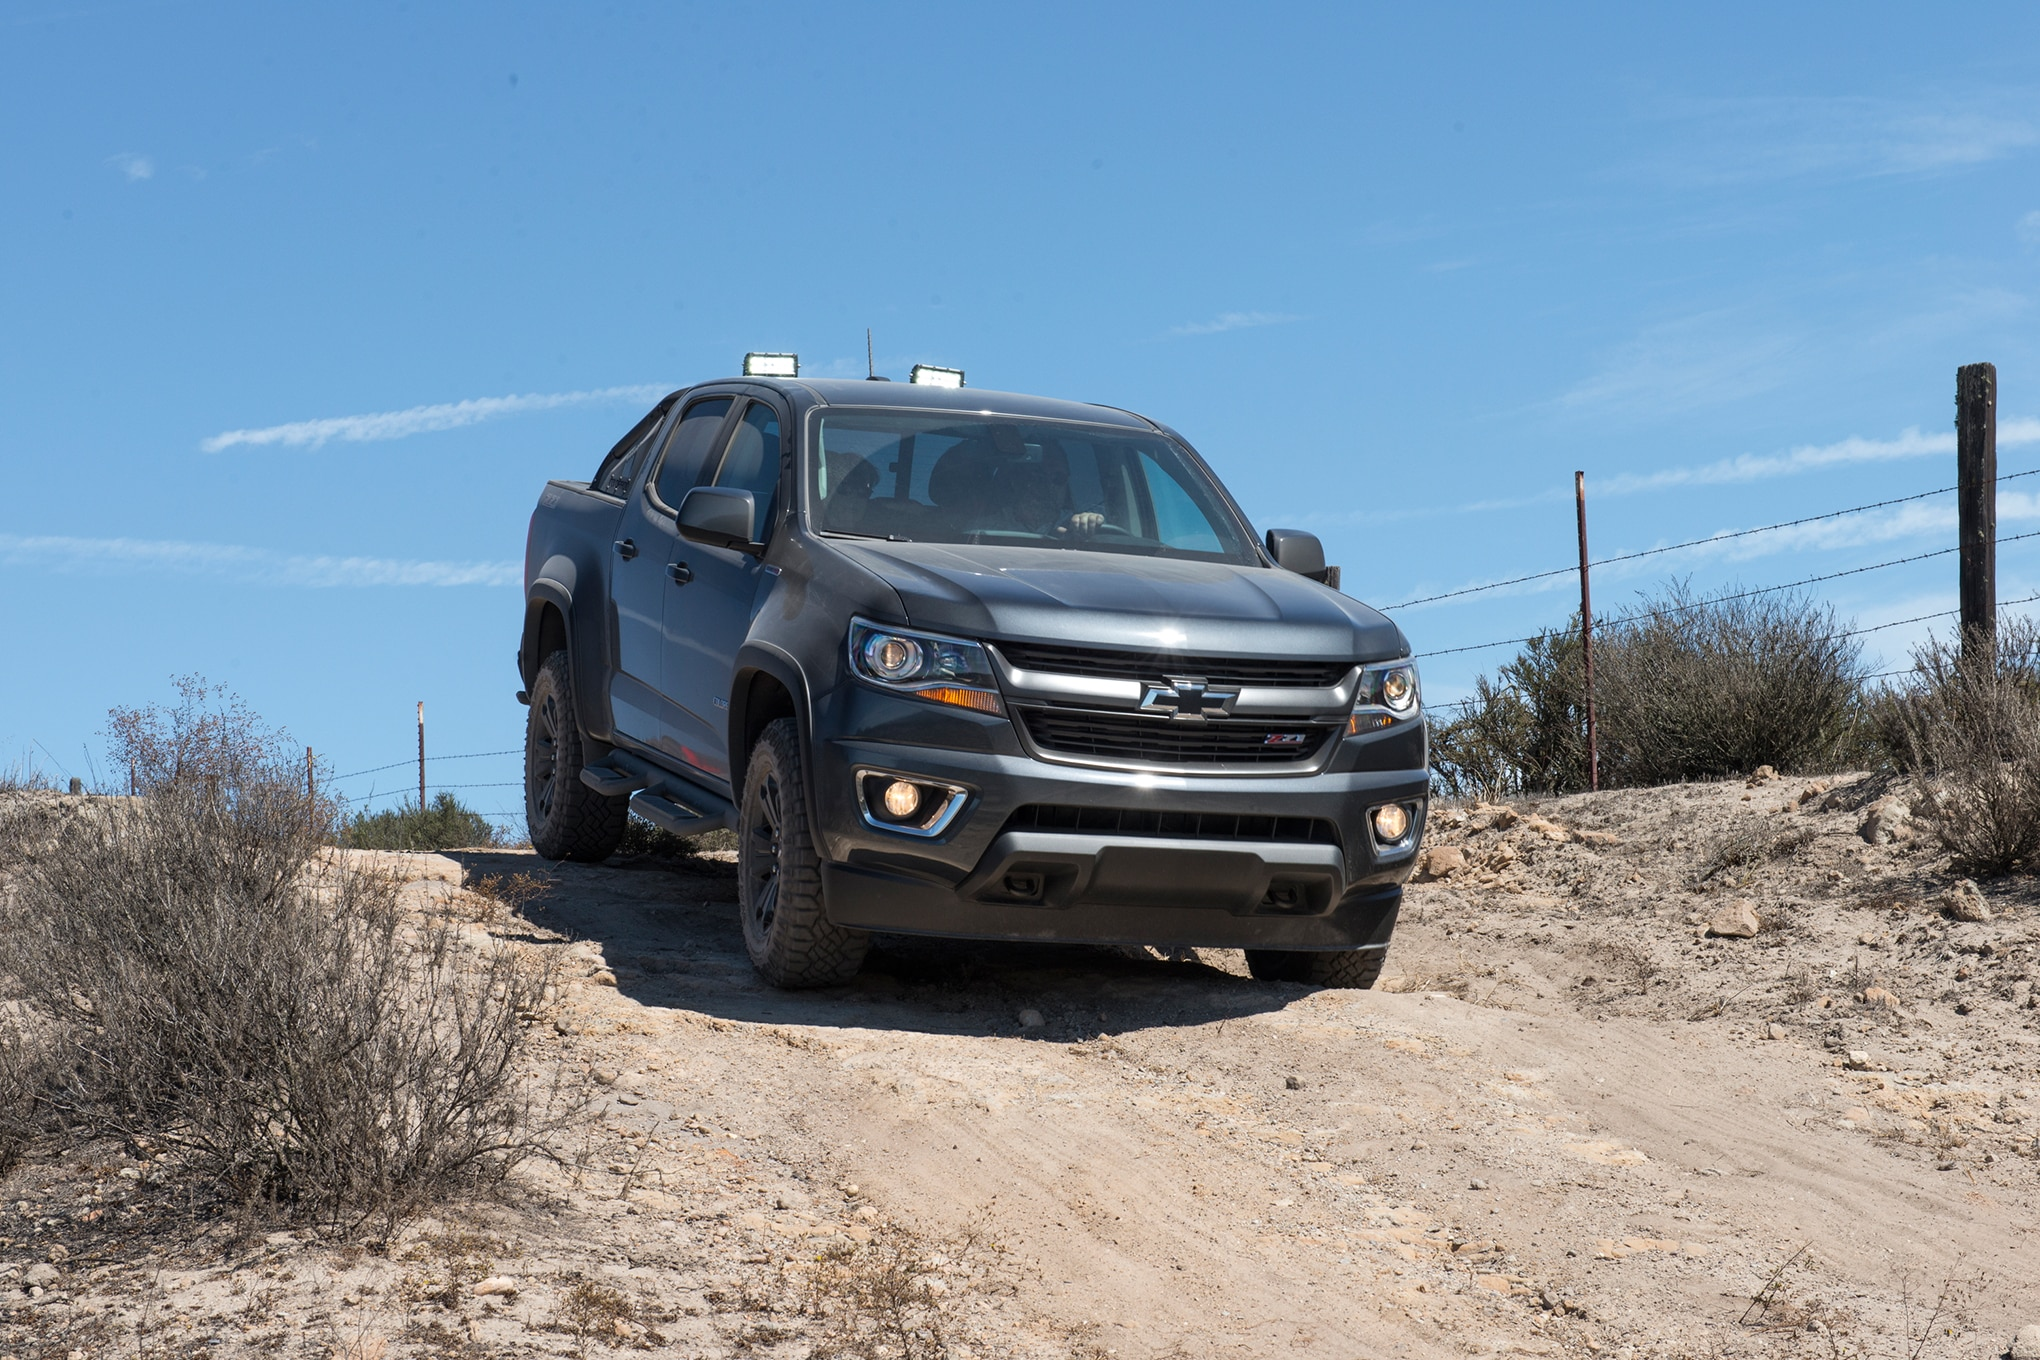 2016 Chevrolet Colorado 2 8L Duramax Diesel – First Drive